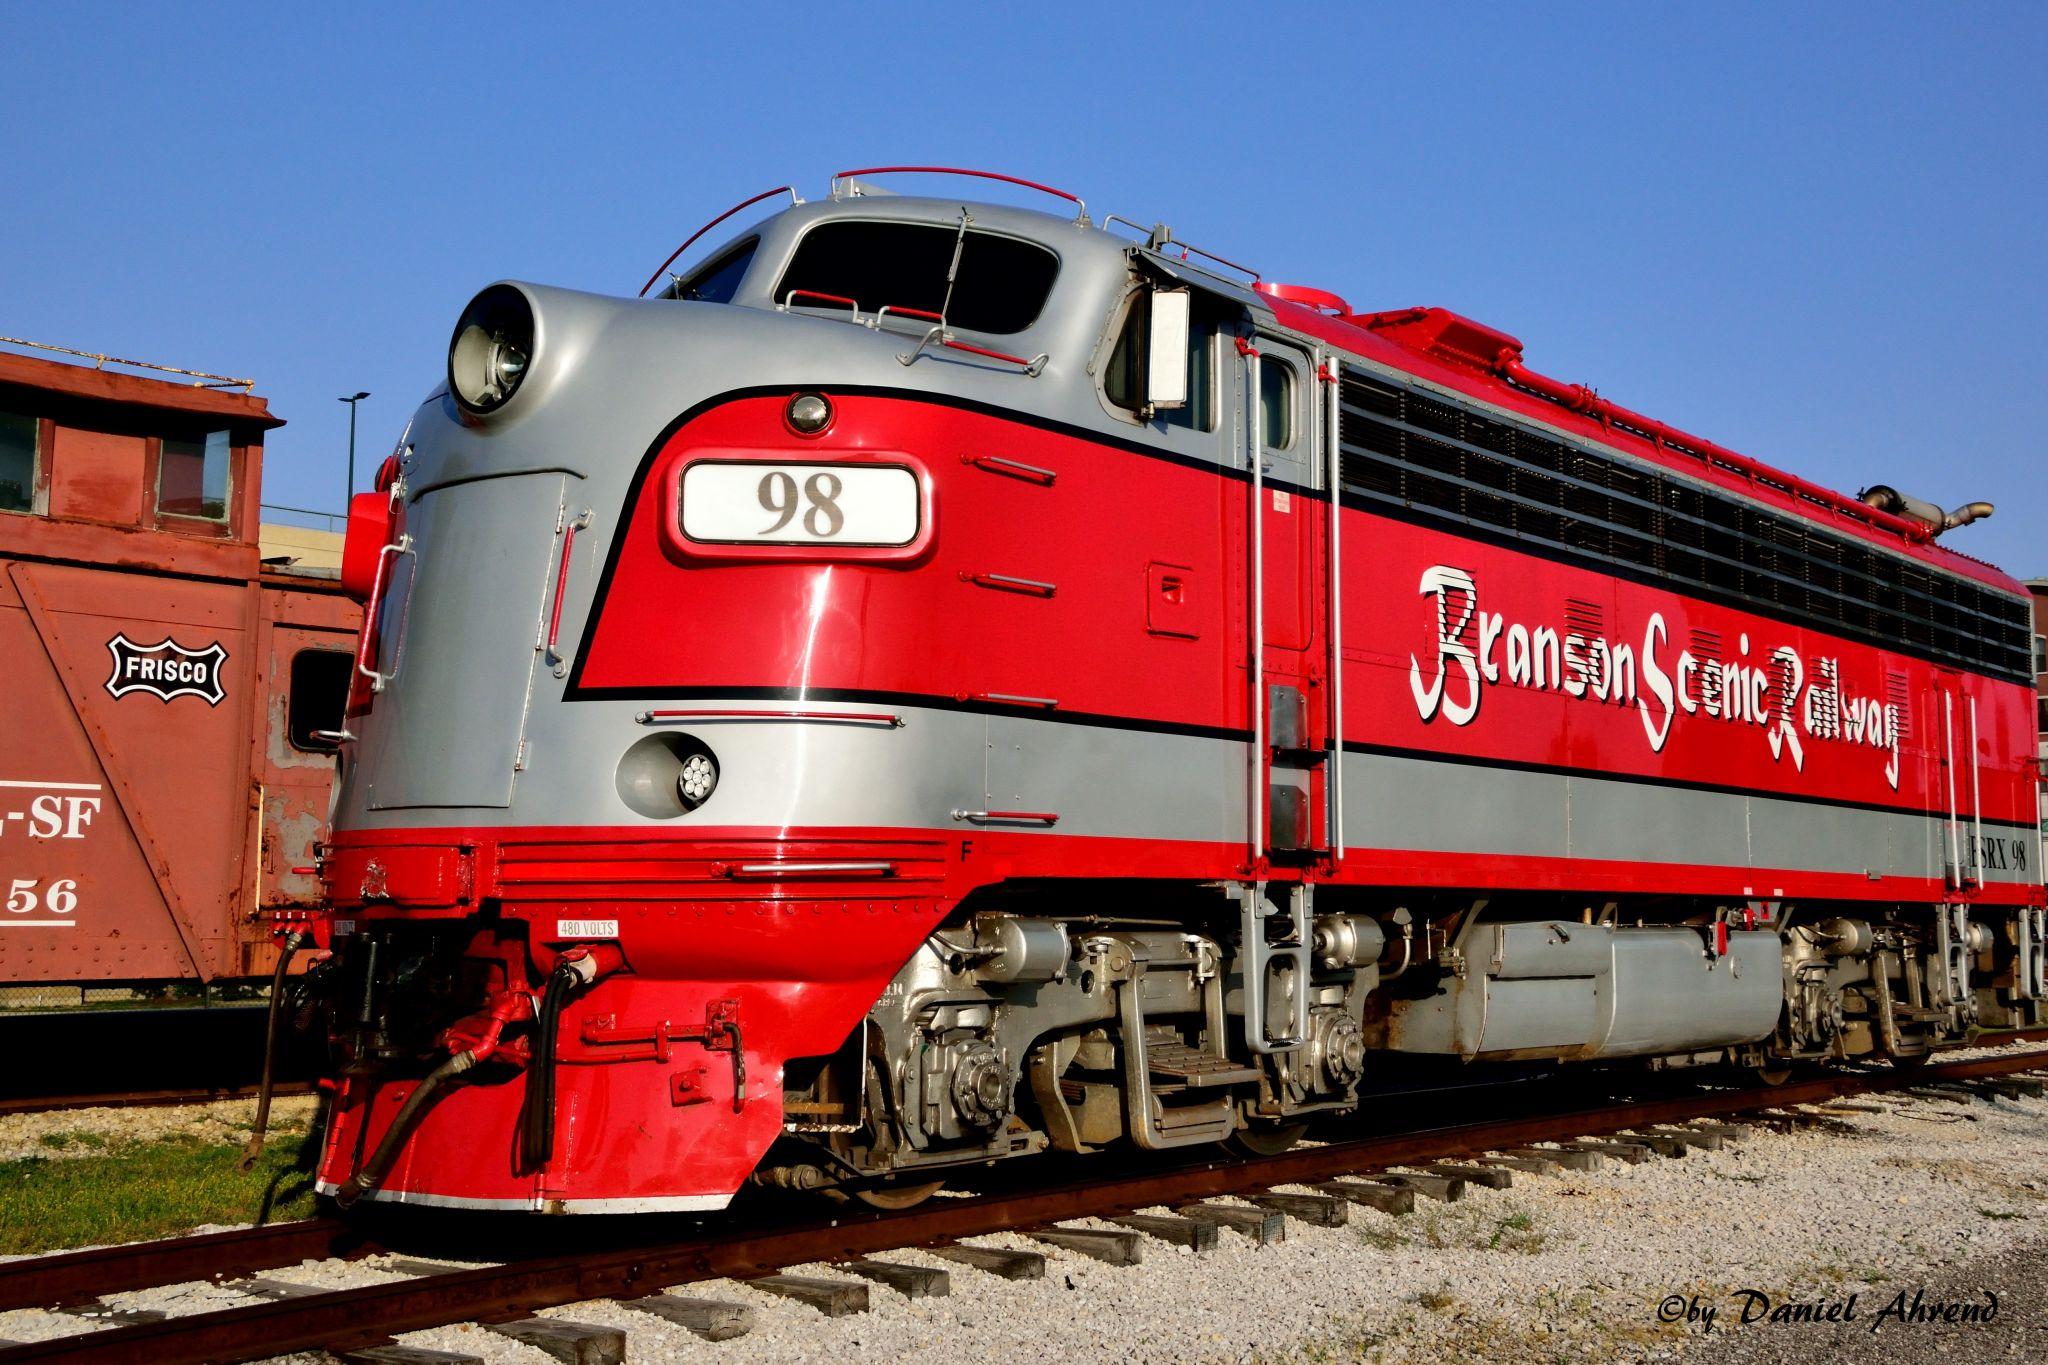 Scenic Railway Branson, Missouri, USA